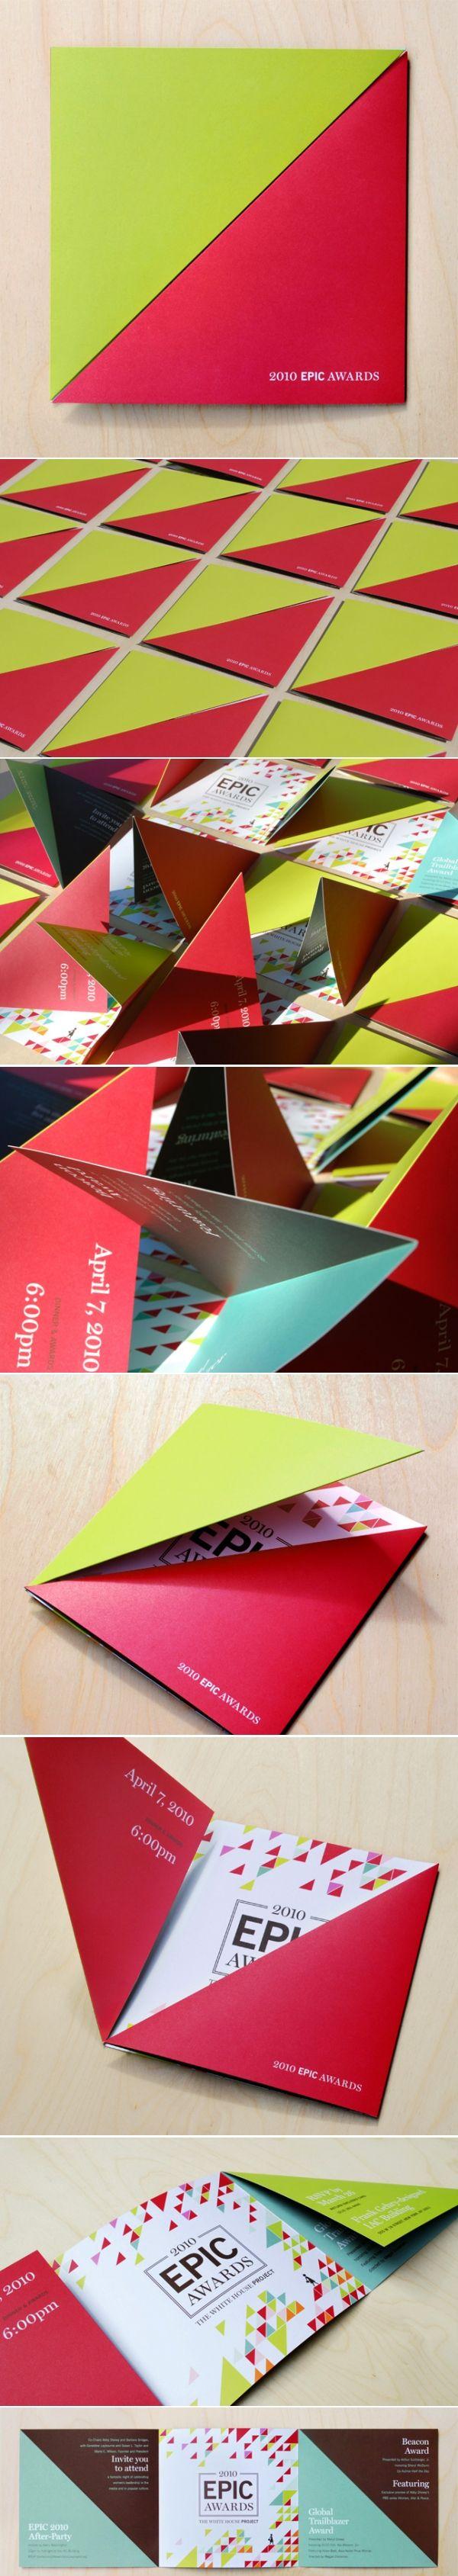 http://www.hyperakt.com/work-detail/223  Platt Grupo Impresor les desea FELIZ DÍA! www.platt-grupoimpresor.com